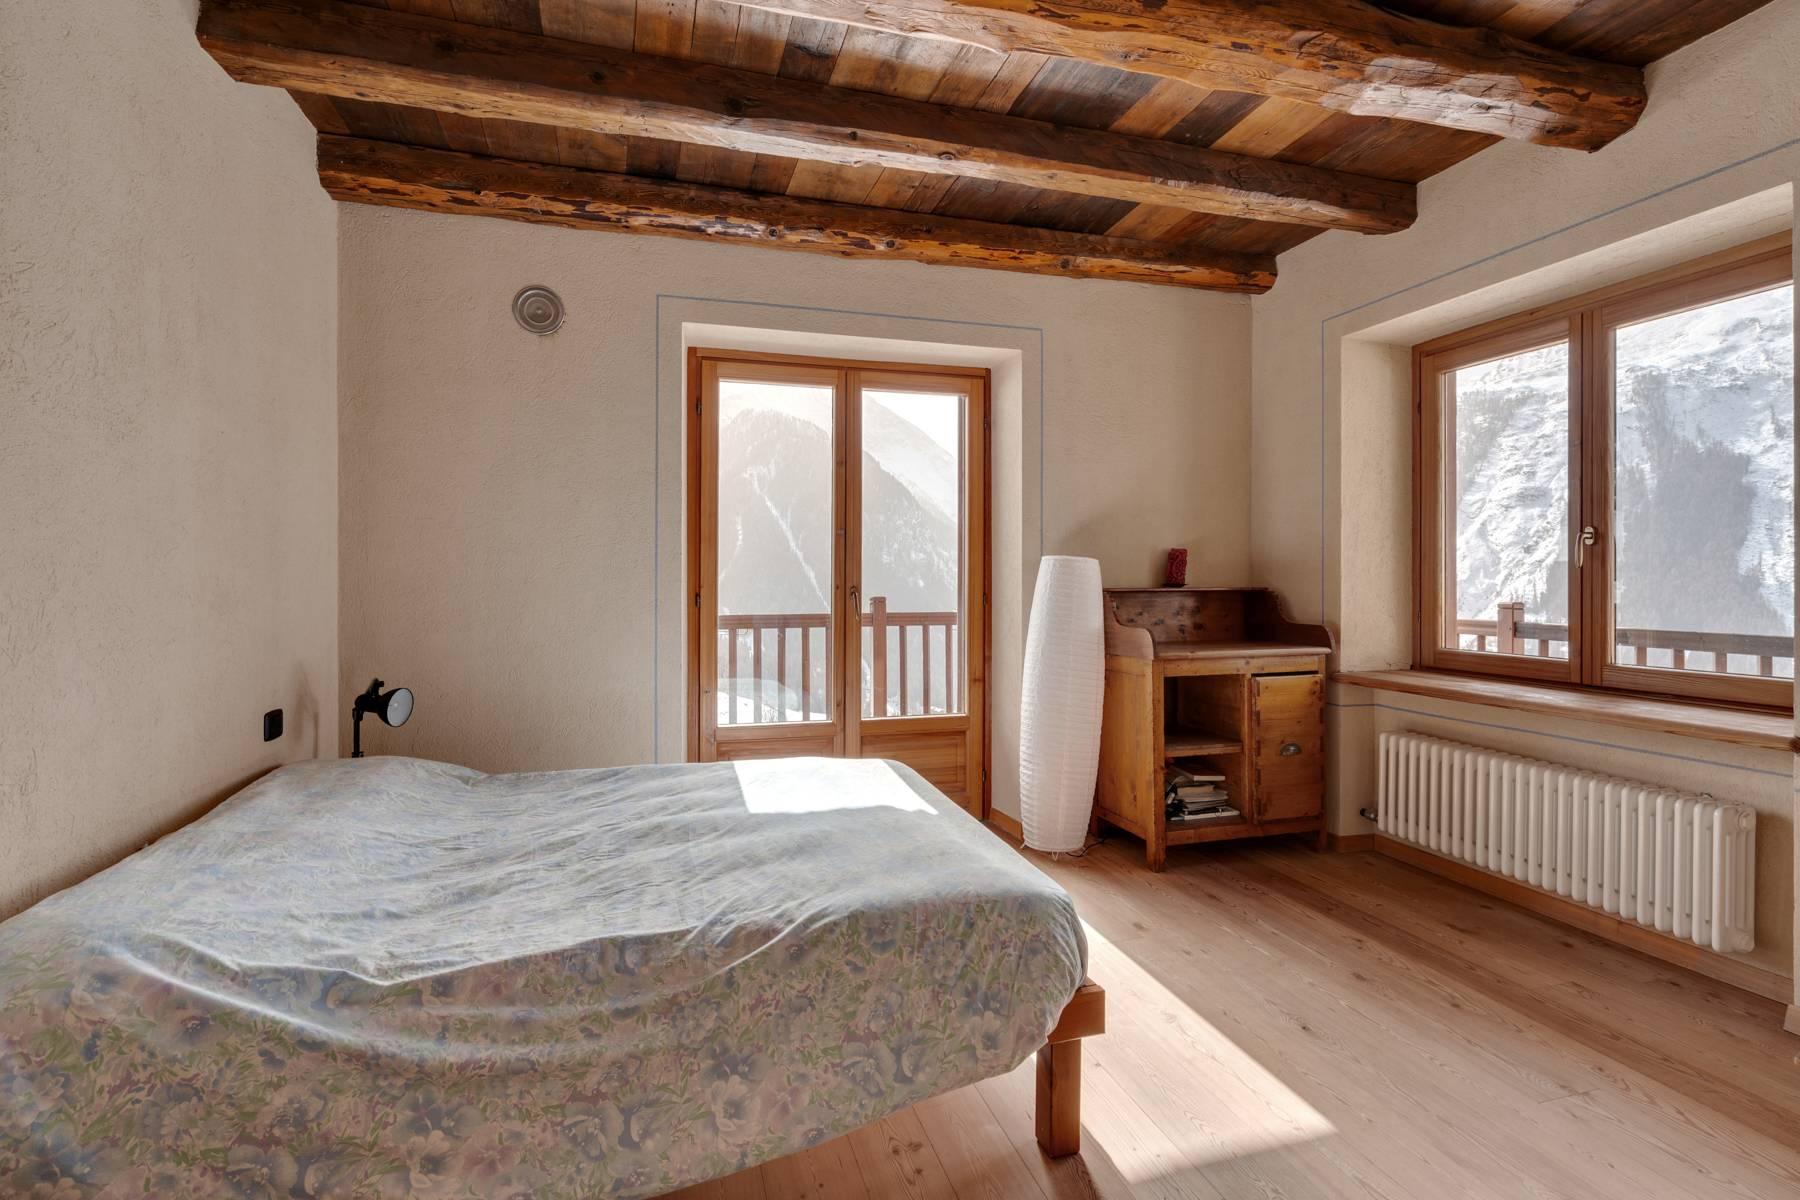 Villa in Vendita a Cogne: 5 locali, 384 mq - Foto 14